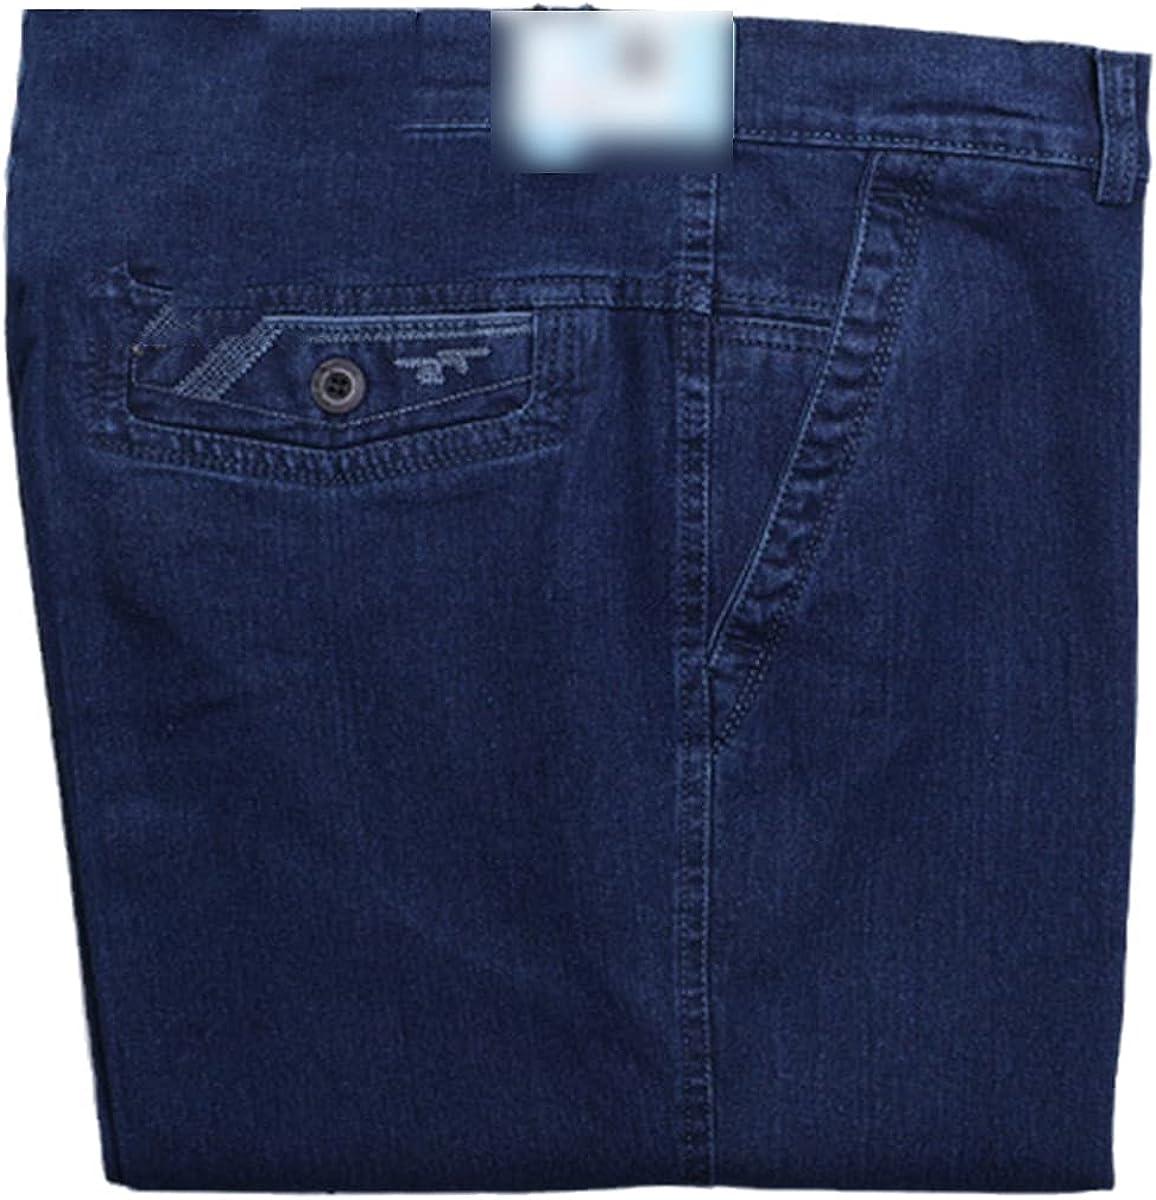 CACLSL Men's Jeans Casual Plus Size mid-Waist Straight-Leg Solid Color Trousers